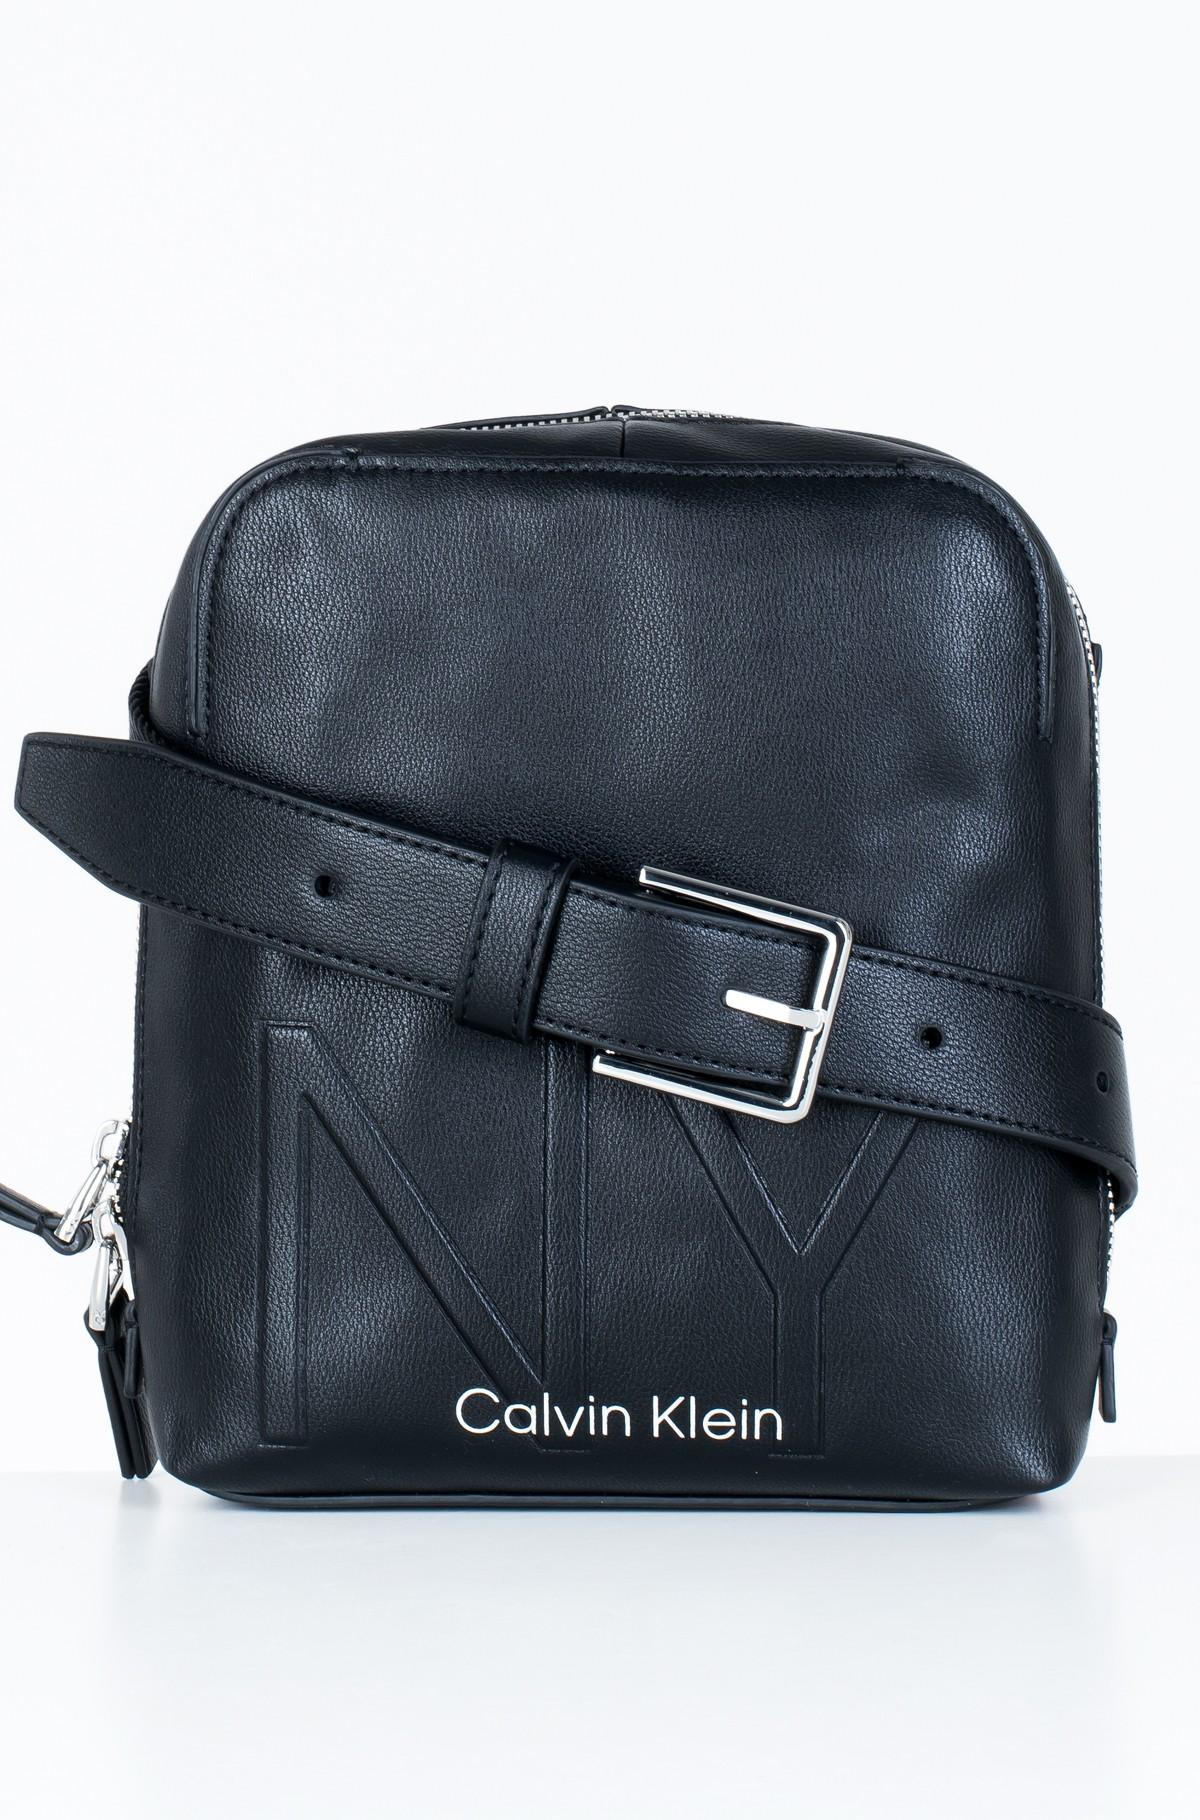 Shoulder bag NY SHAPED CVRTBL MINI REPORTER-full-1